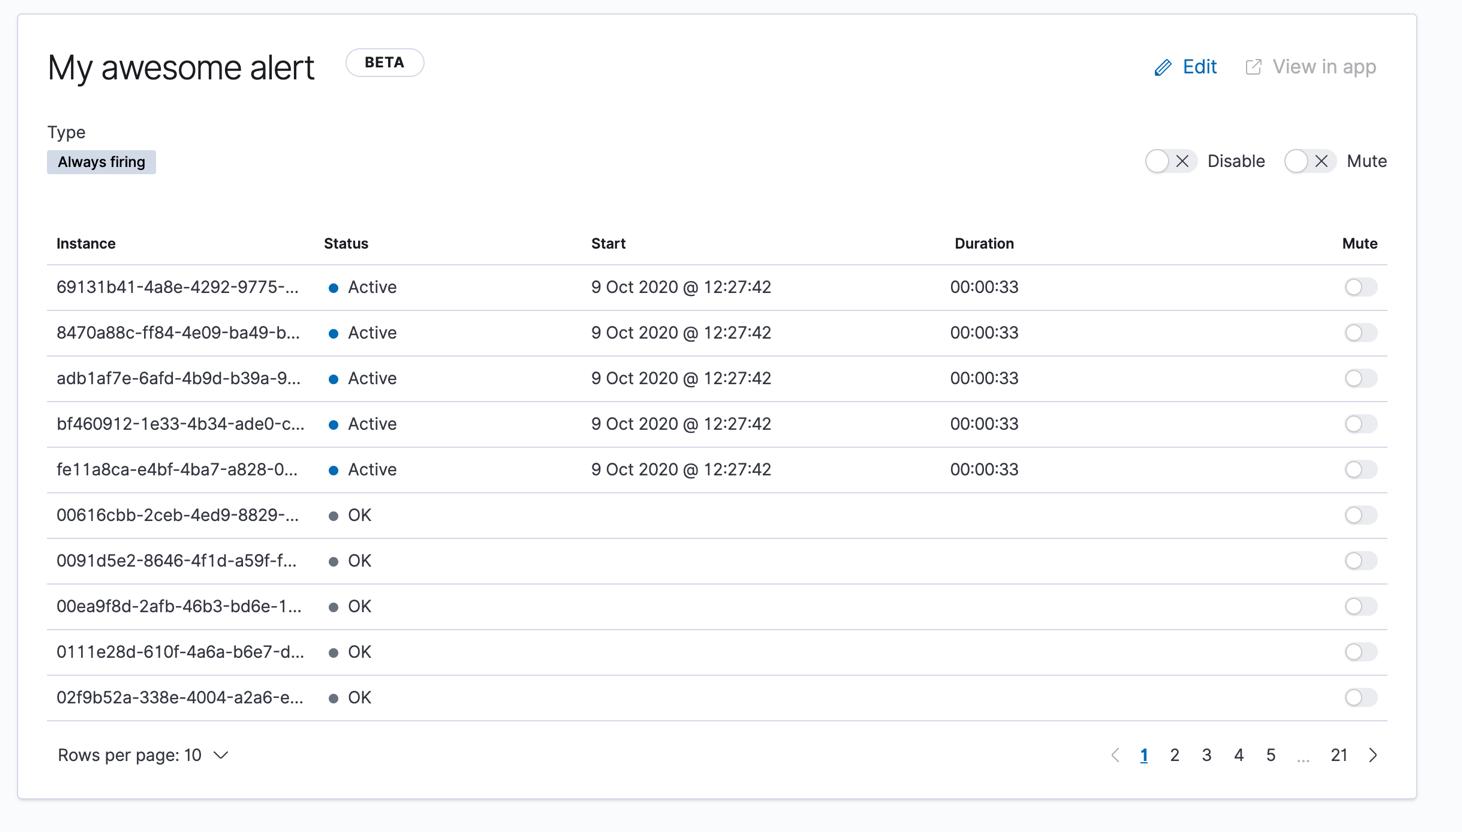 screenshot-alerts-detail-page-710-731x416.png